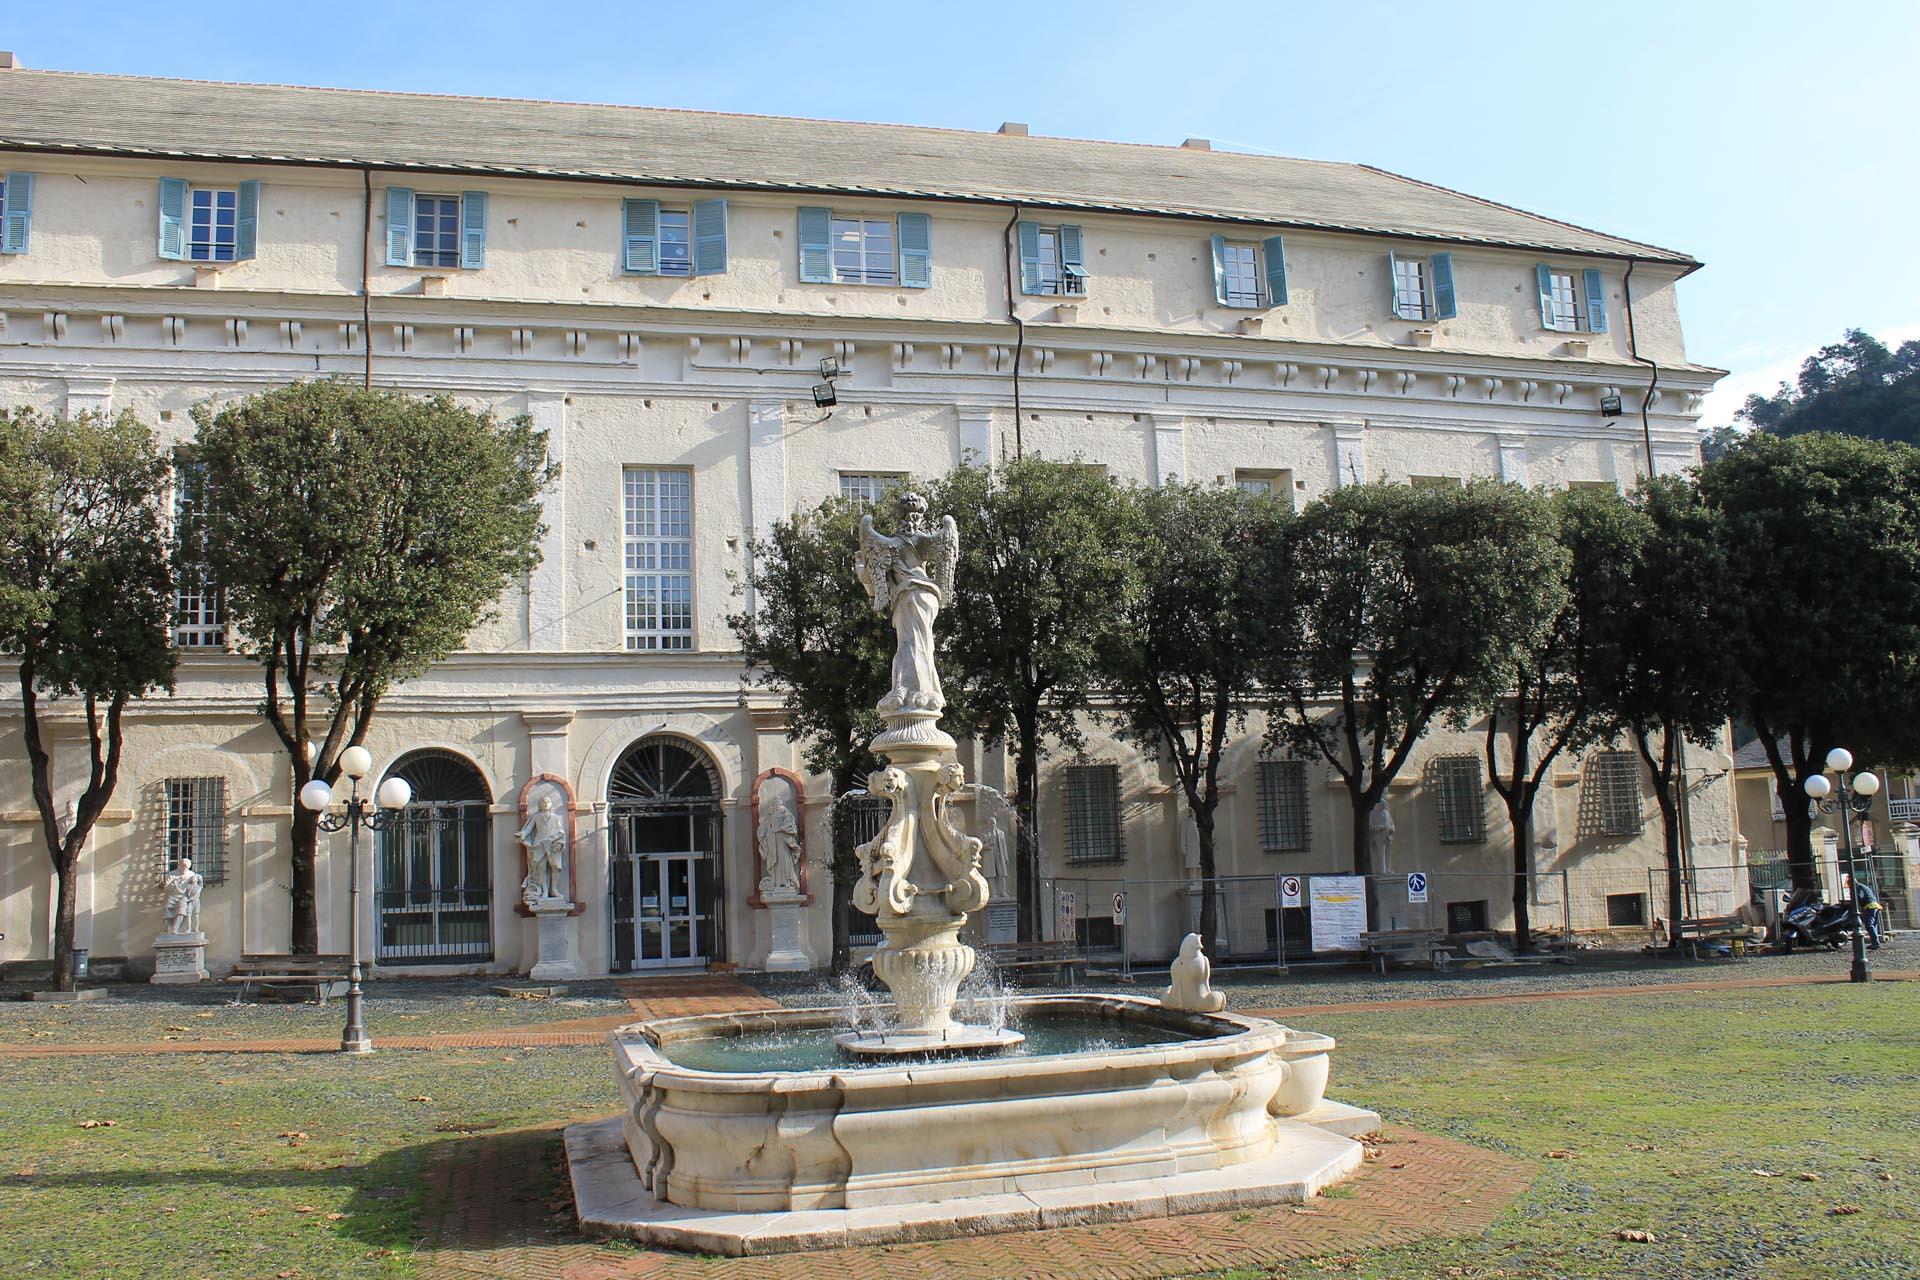 Residenza Sanitaria Assistenziale Santuario | Piazza Santuario 4 | Savona